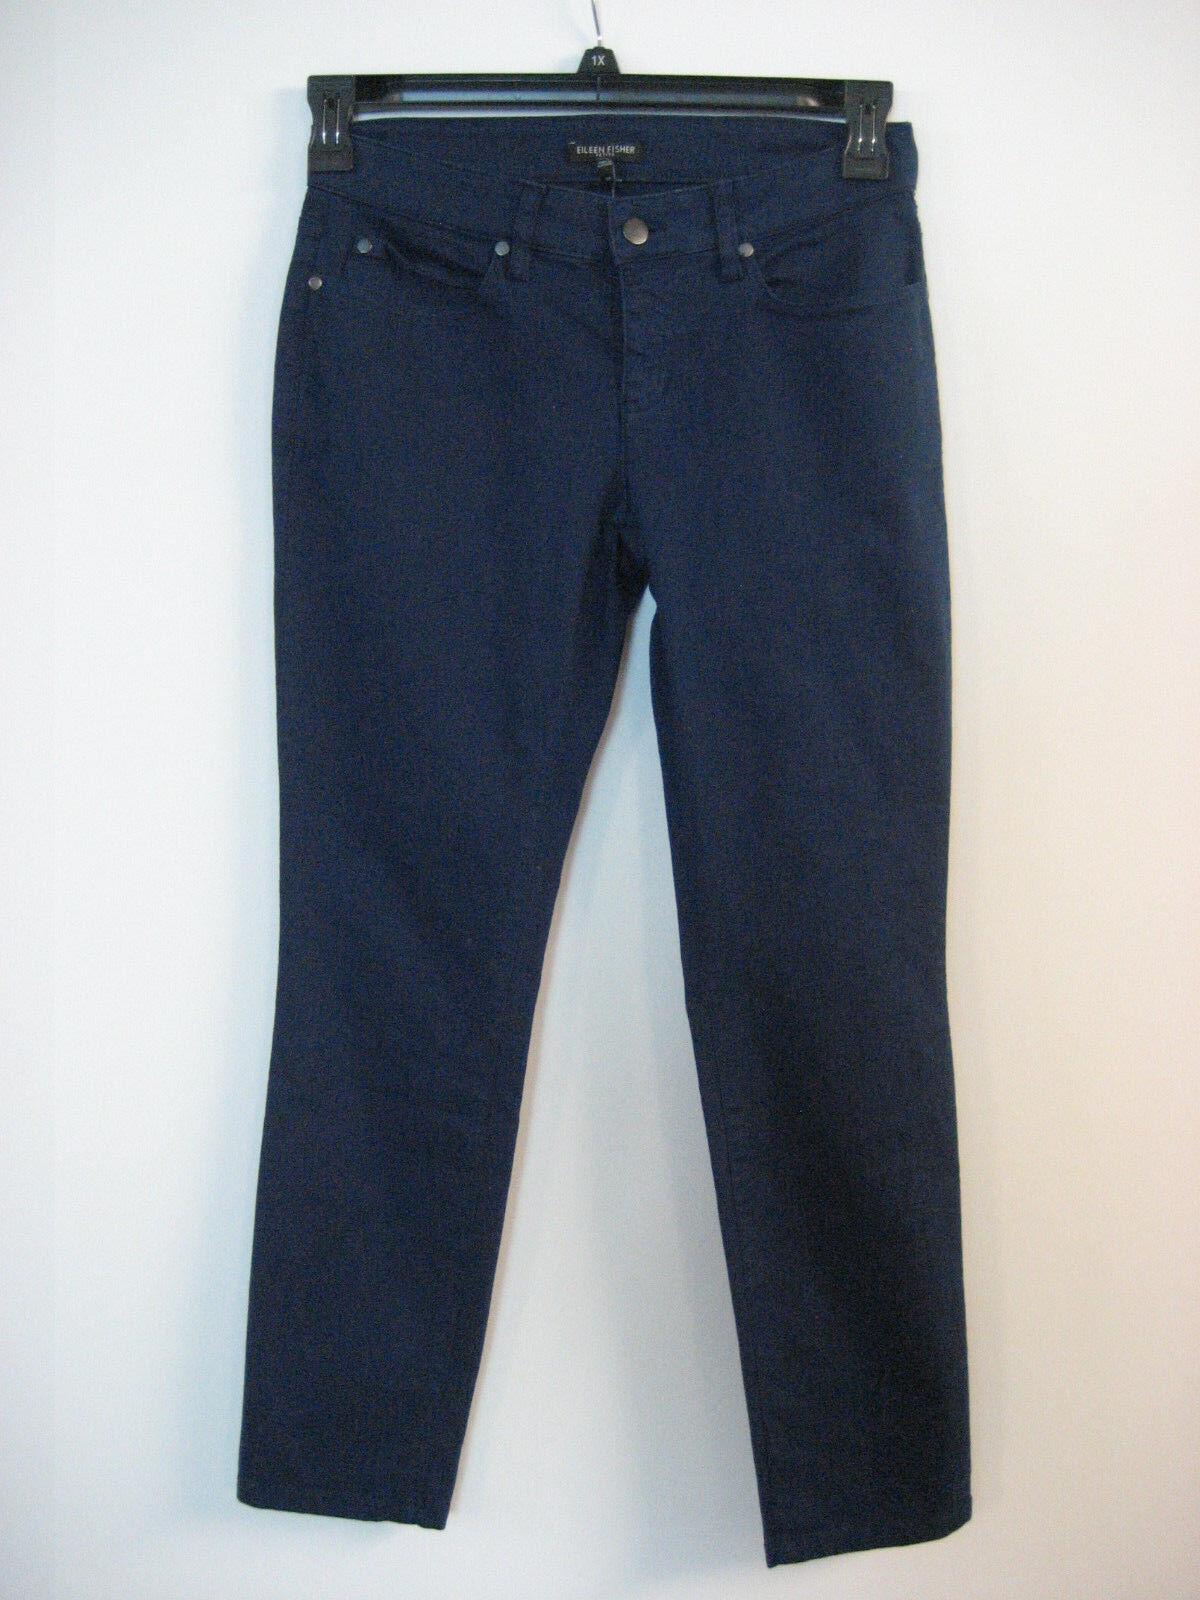 EILEEN FISHER Stretch Twill Cotton blå Bonnet Slim Ankle Pants 2P NWT  178